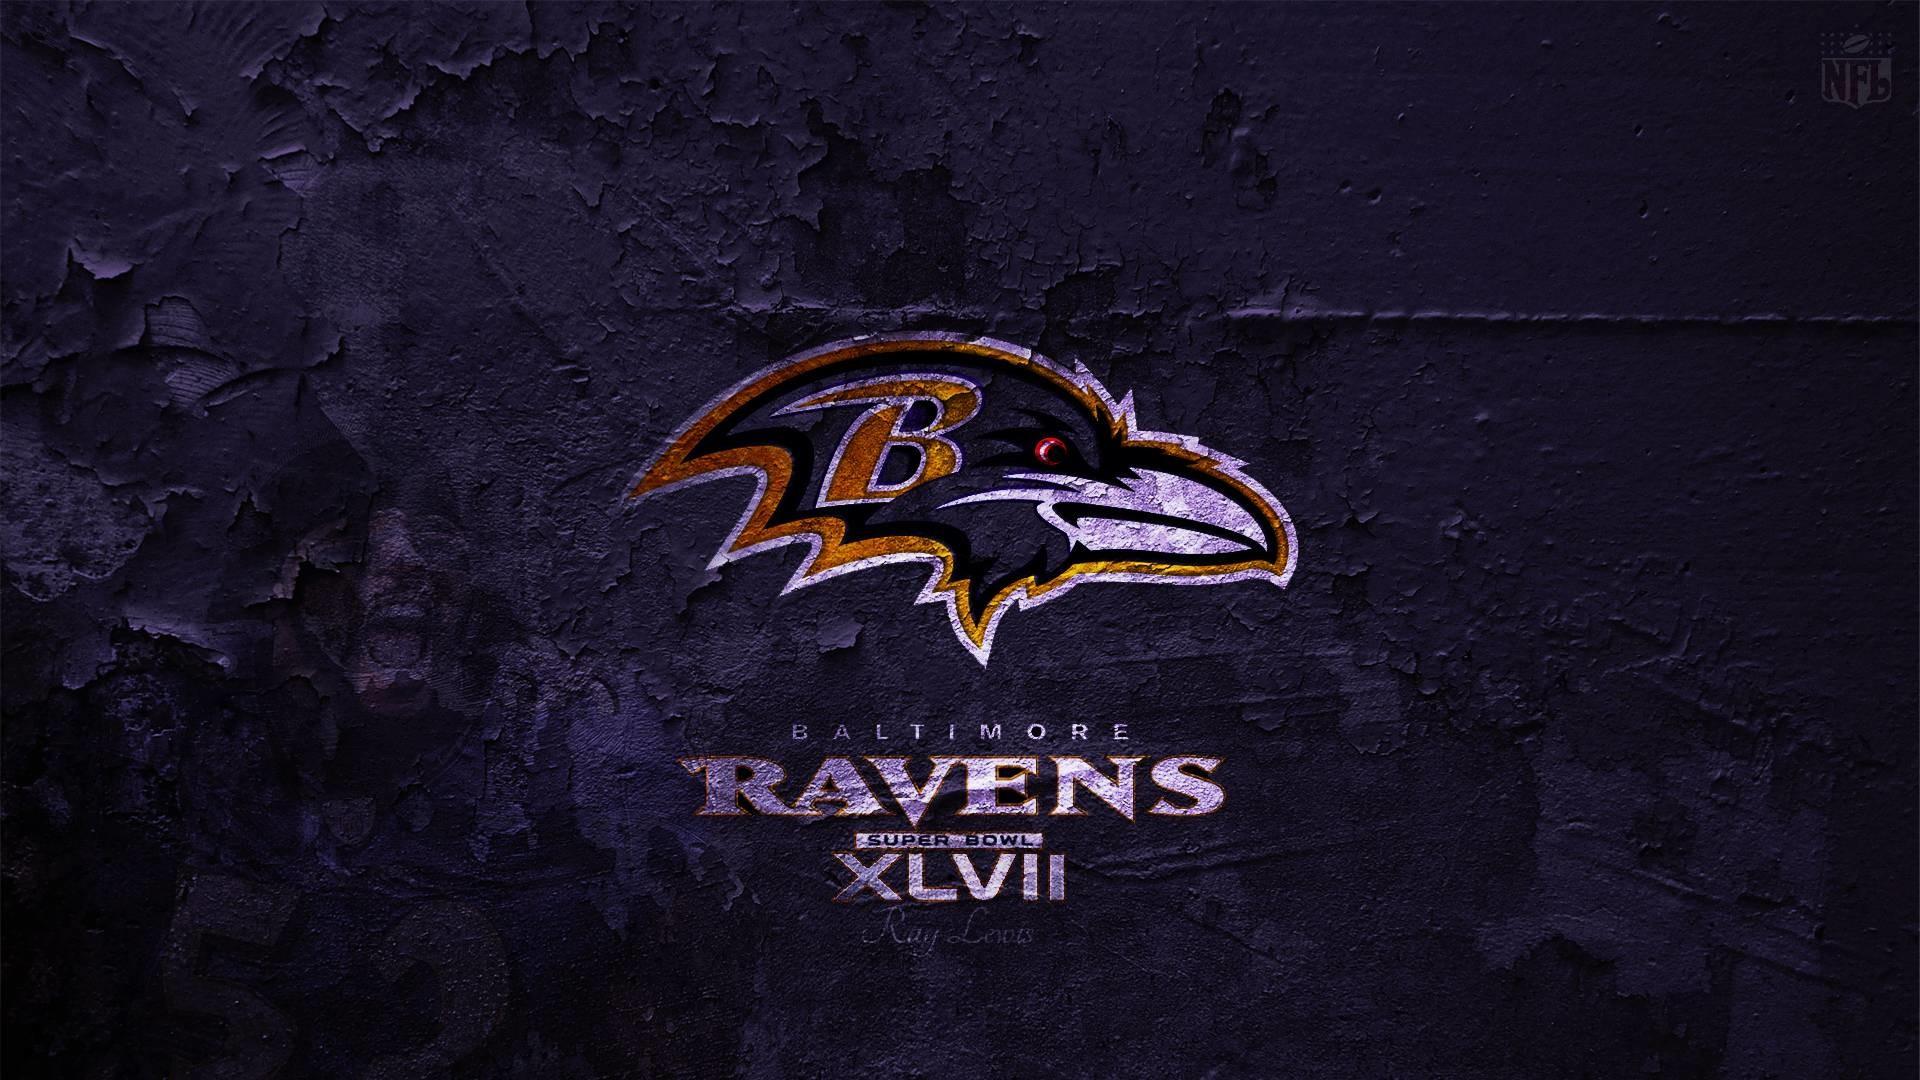 Wallpaper of the day: Baltimore Ravens   Baltimore Ravens wallpapers